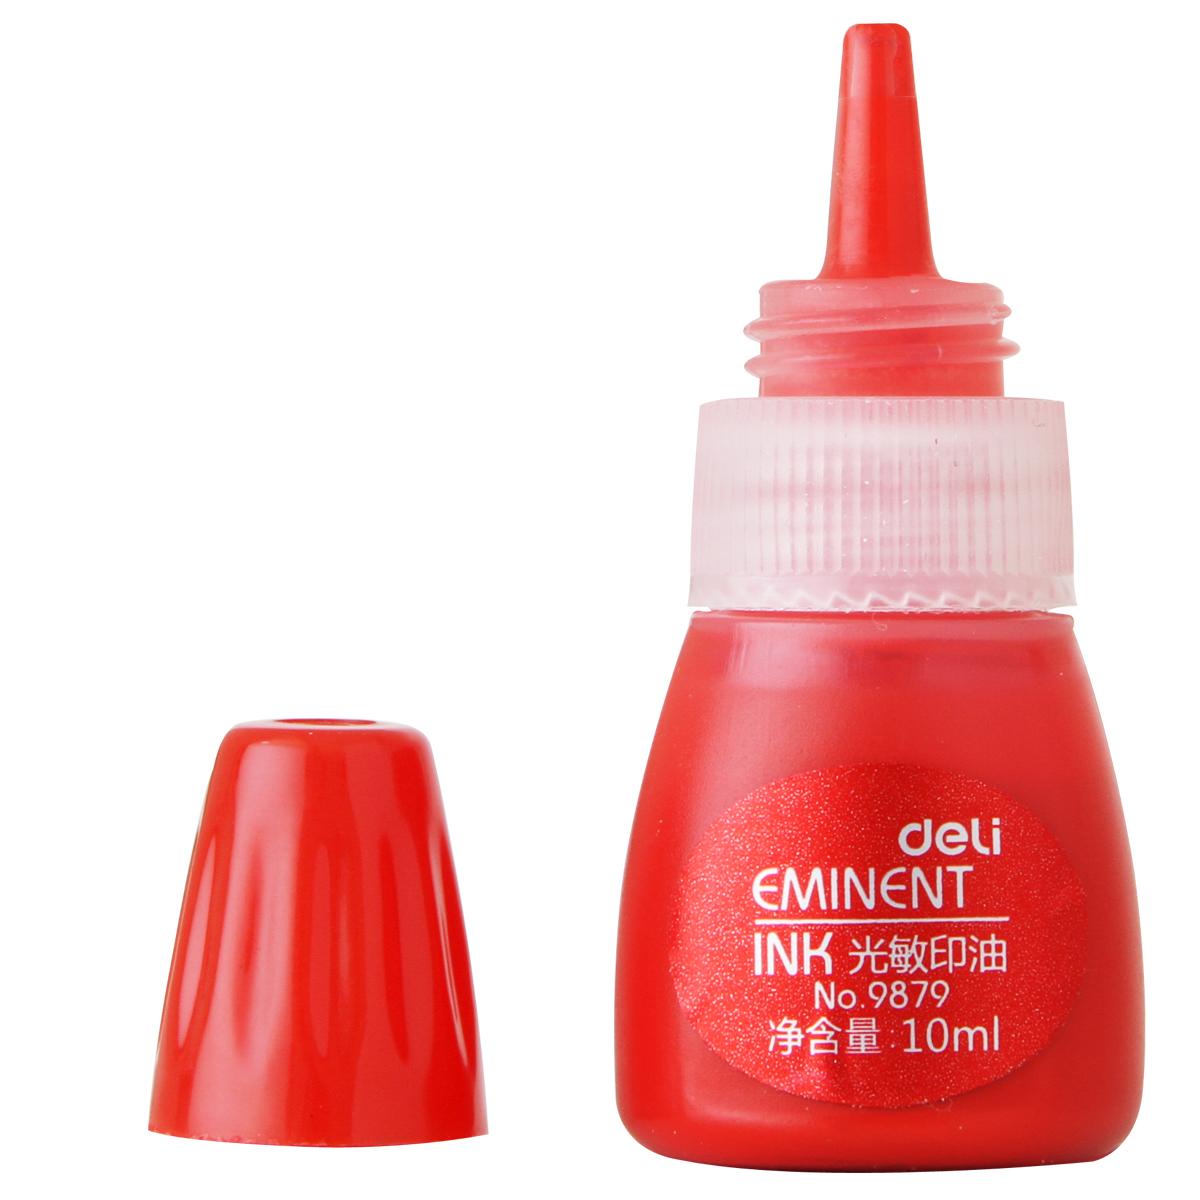 得力(deli)9879光敏印油 光敏印章油 红色